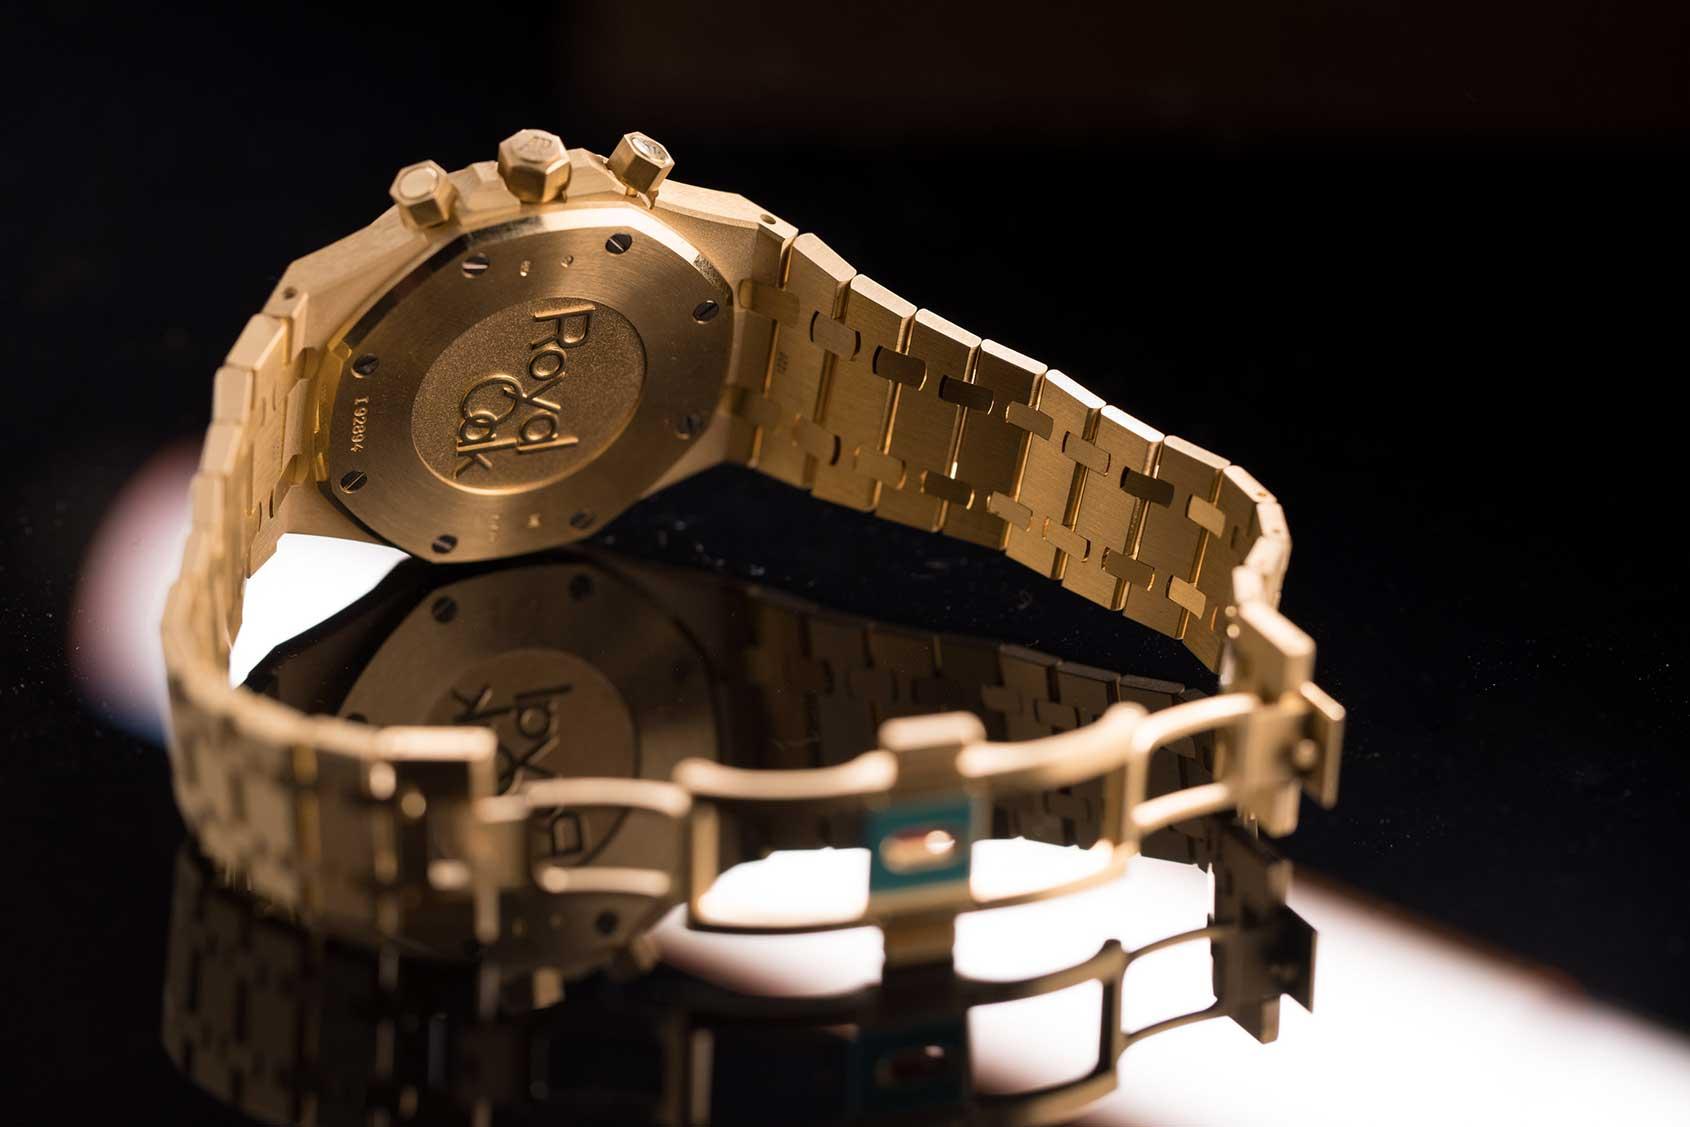 1a533d2fc50 Audemars Piguet Royal Oak Chronograph in Yellow Gold – Hands-on Review